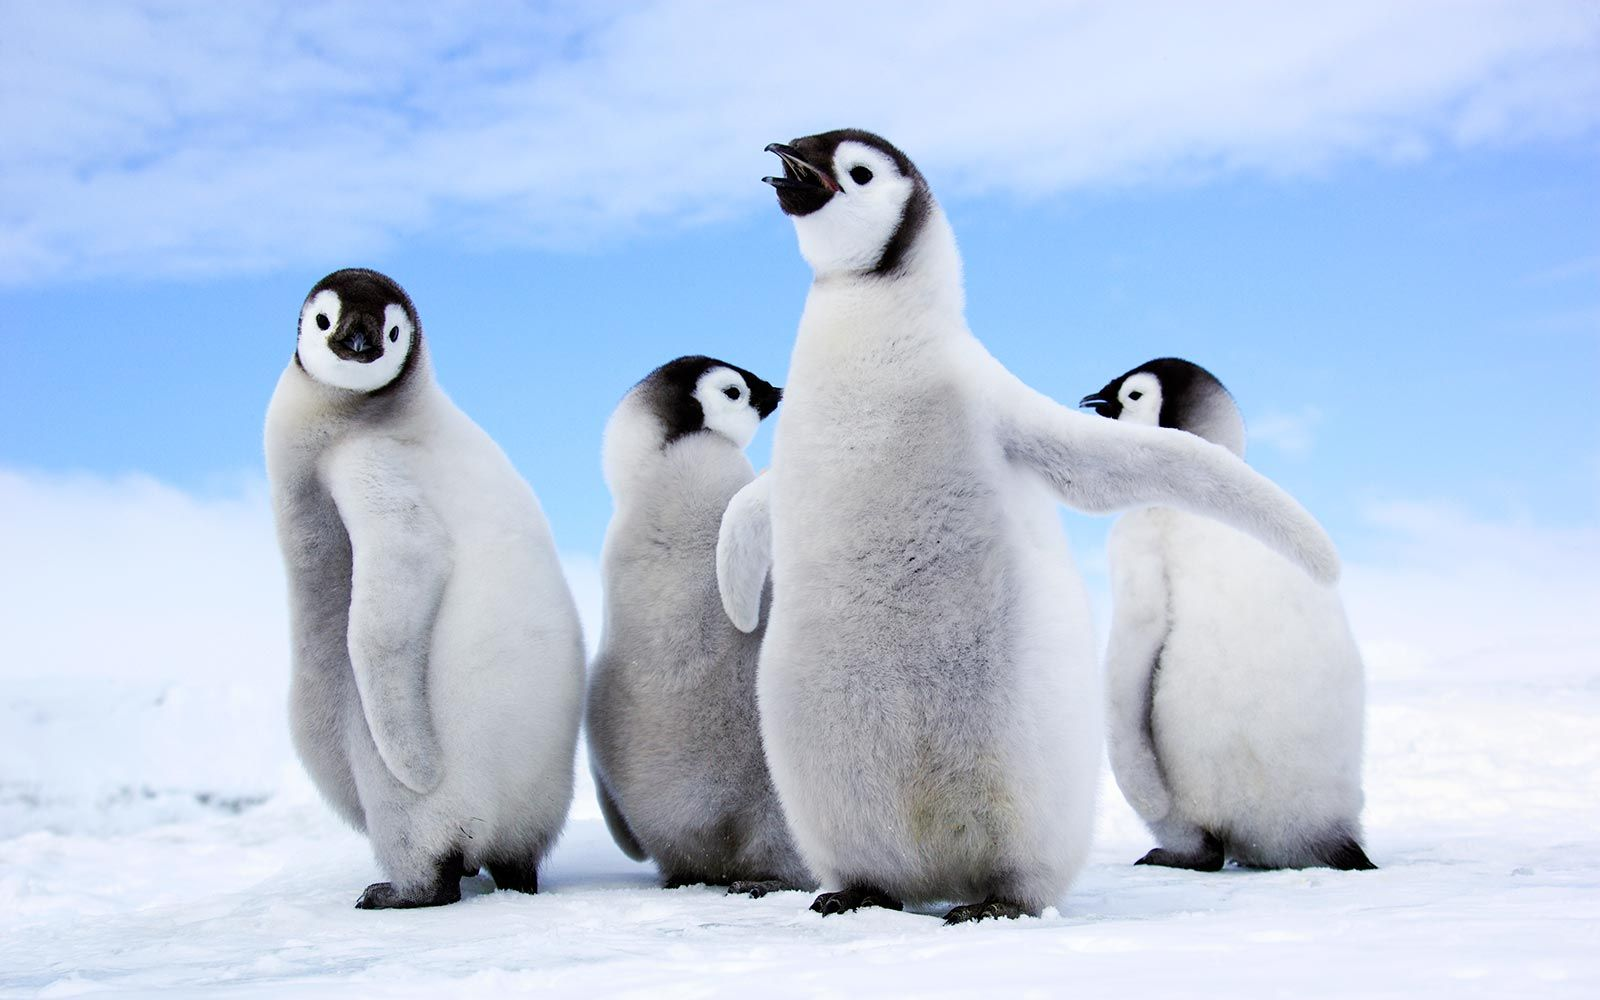 emperor-penguins-antarctica-PENGUINGAMES0218.jpg